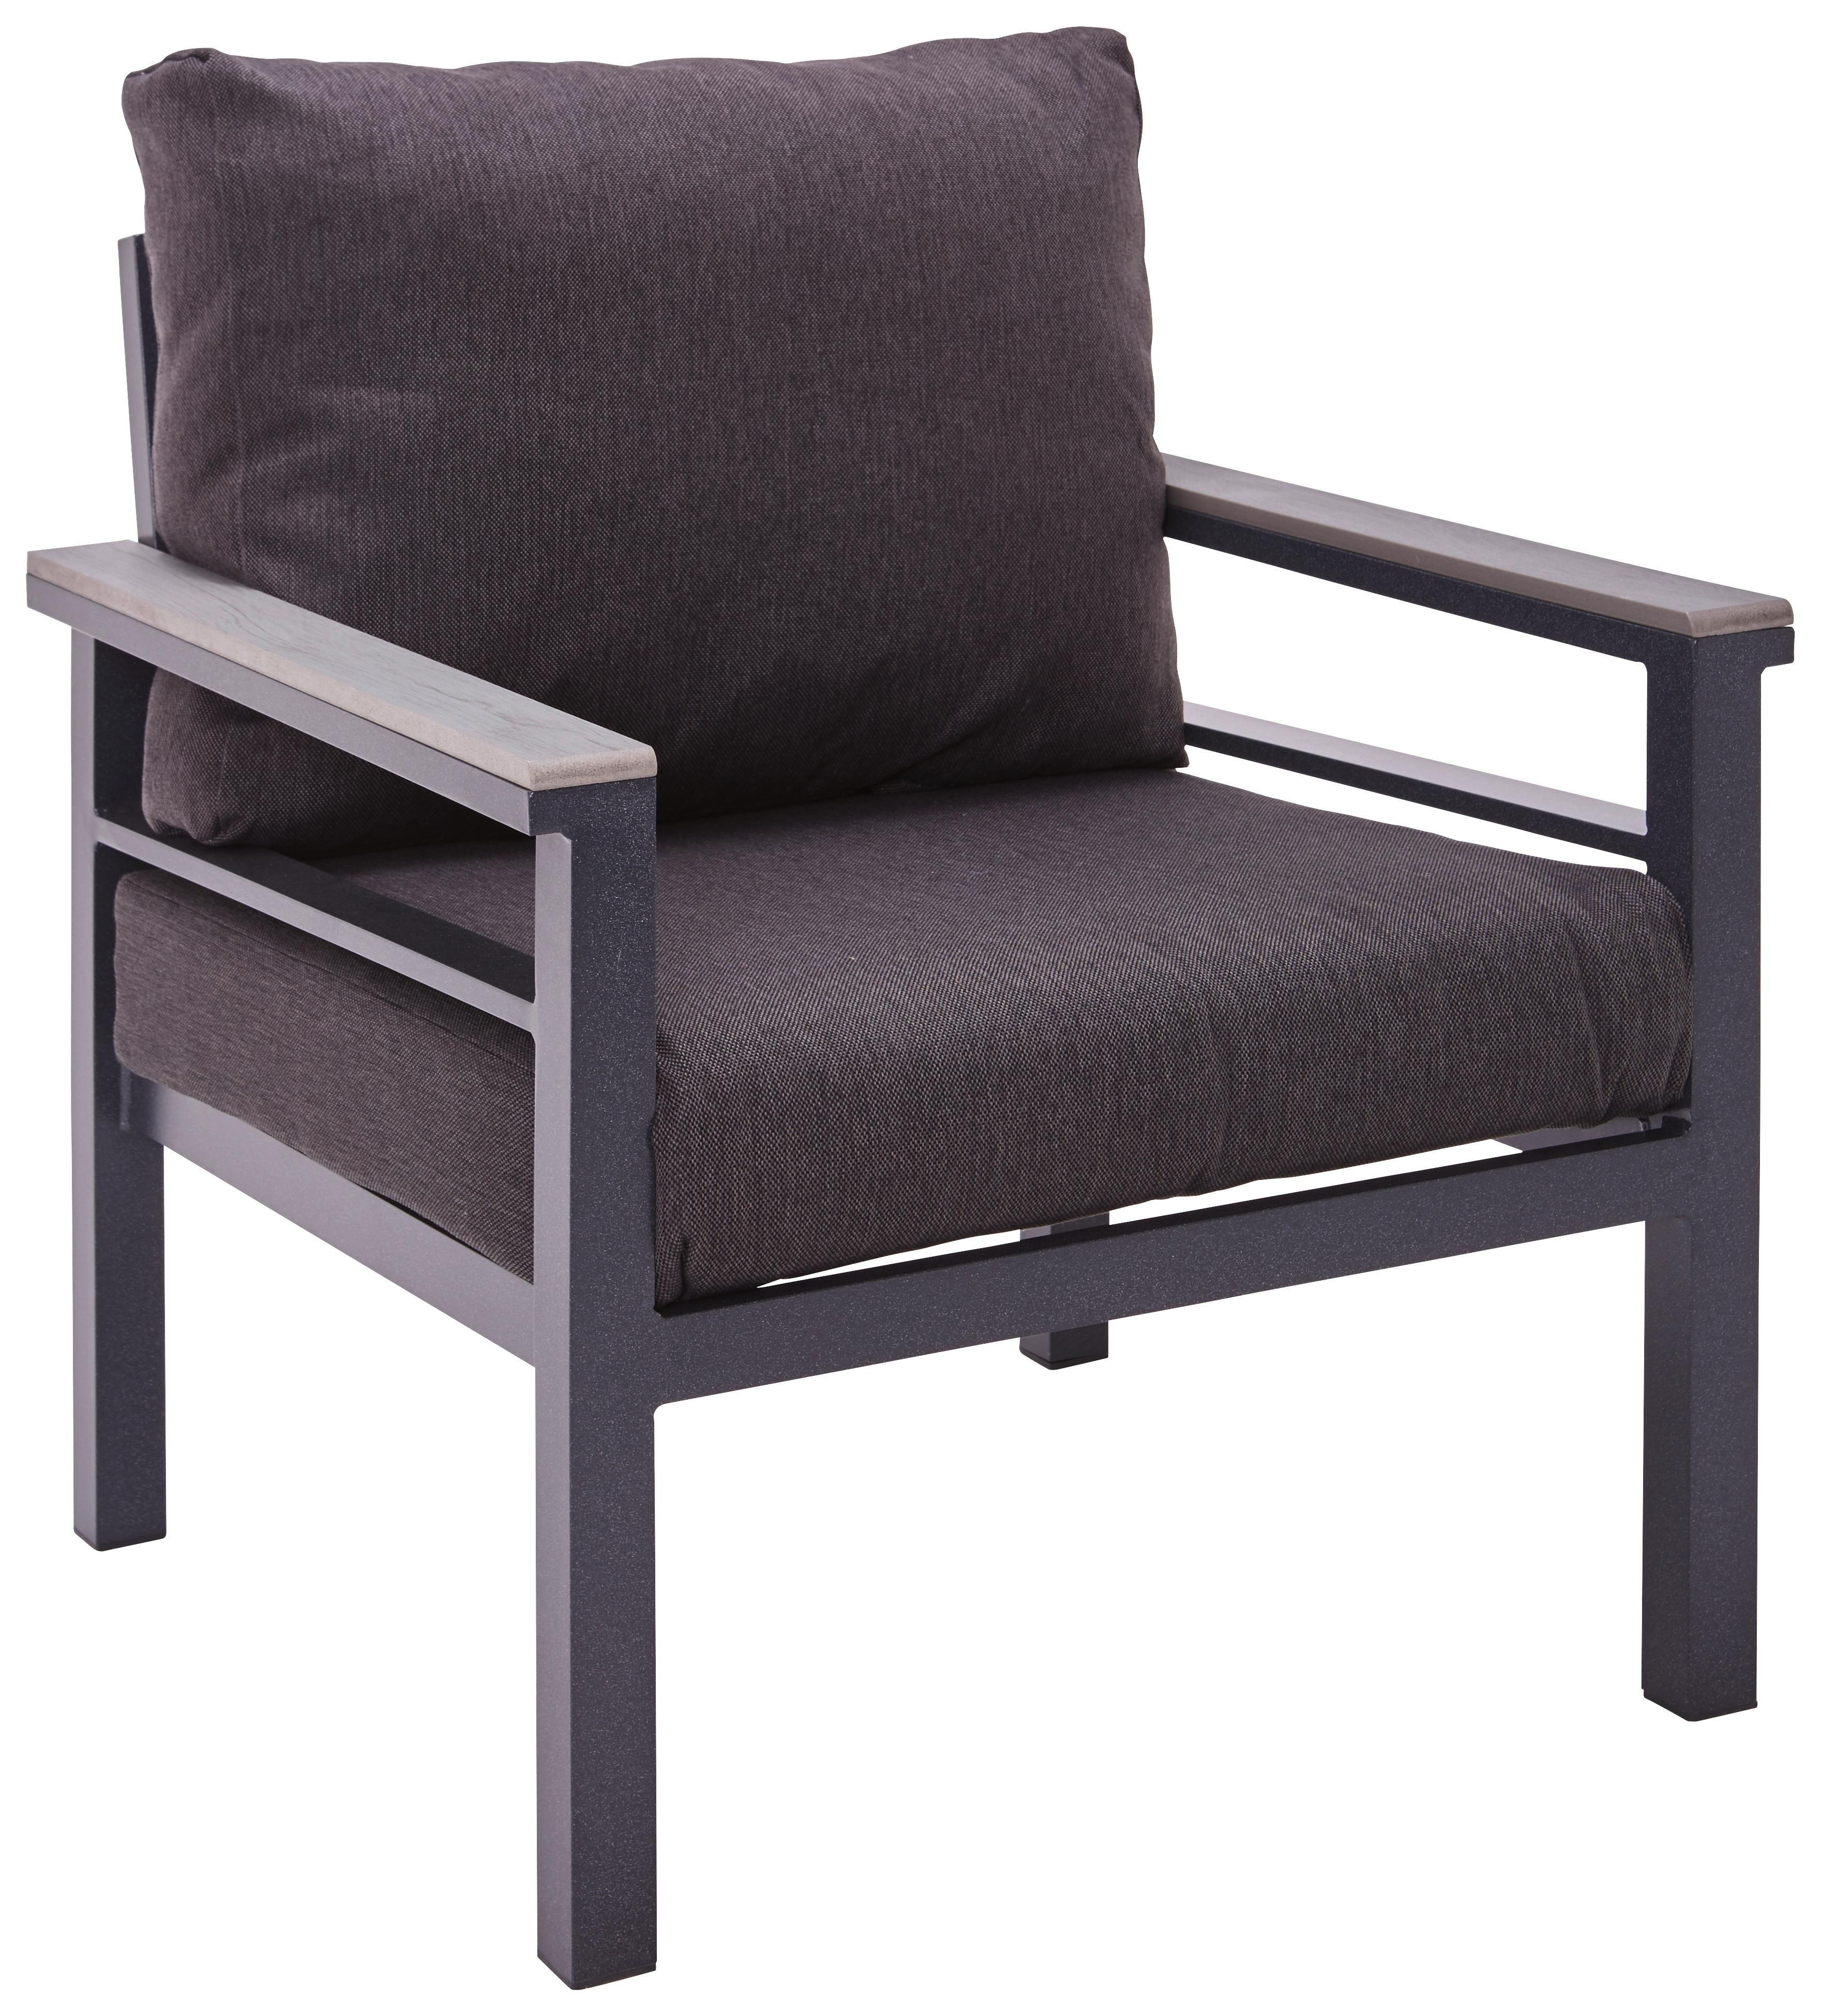 Loungesessel Aus Aluminium Mit Kissen Entdecken Lounge Sessel Sessel Lounge